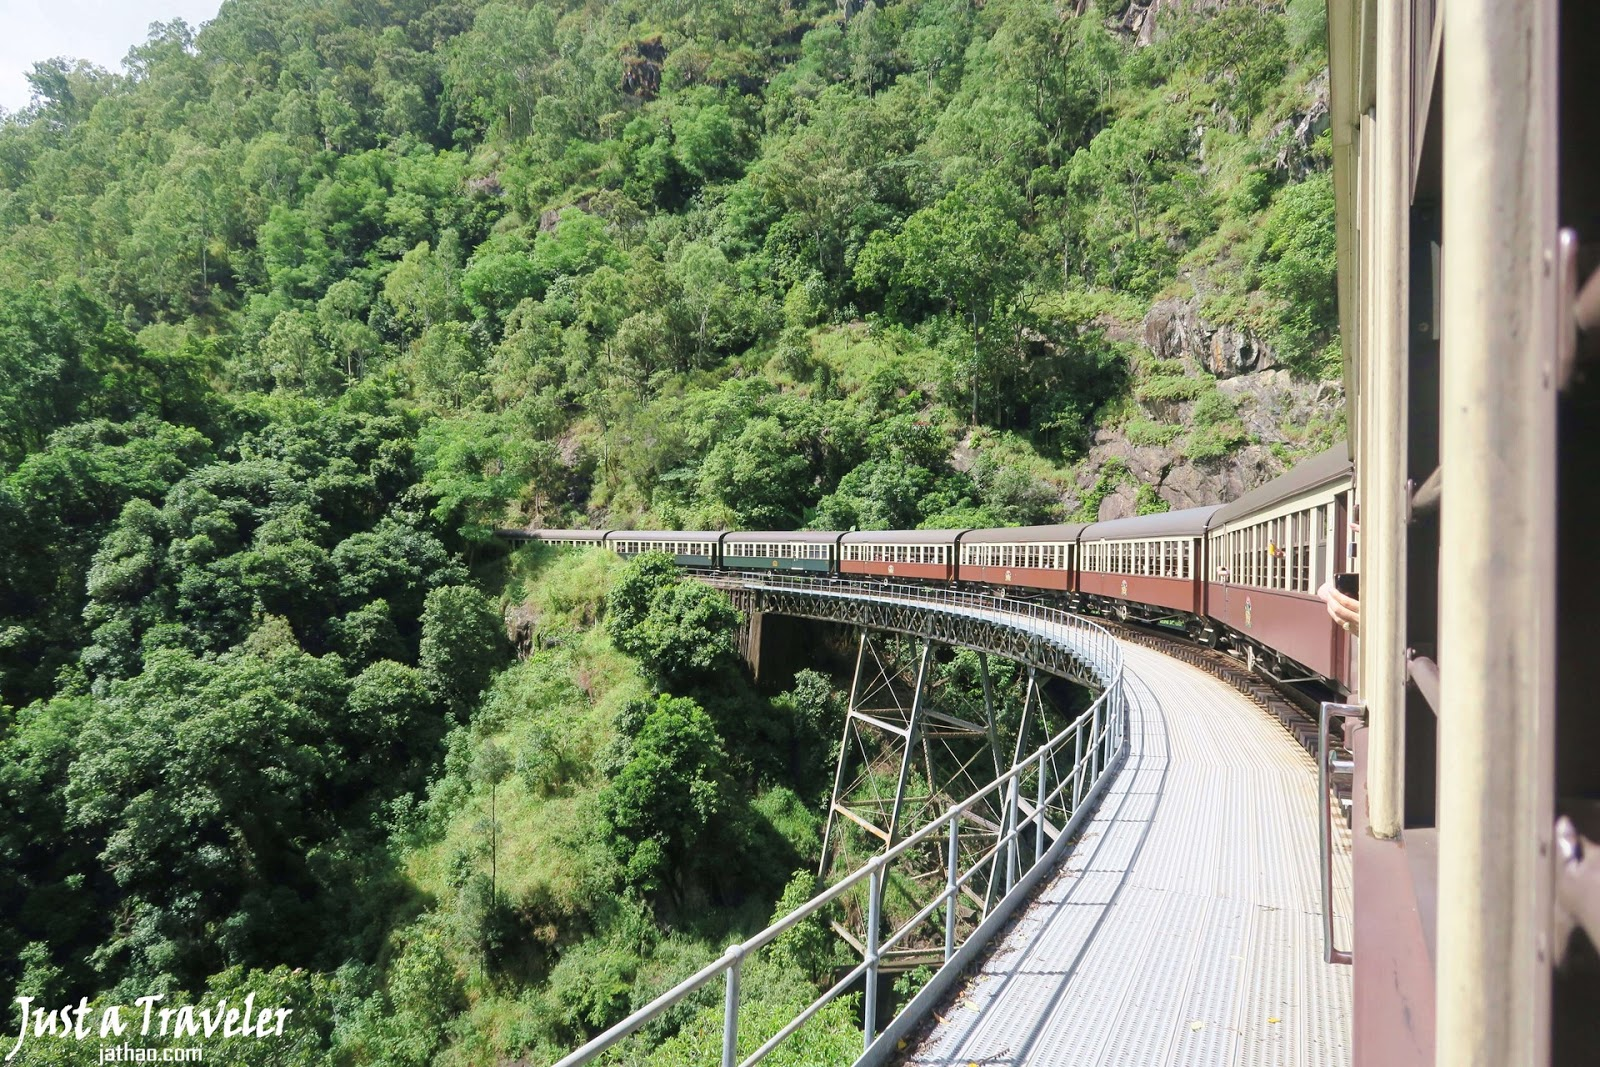 凱恩斯-景點-推薦-庫蘭達-火車-旅遊-自由行-澳洲-Cairns-Tourist-Attraction-Kuranda-Train-Travel-Australia